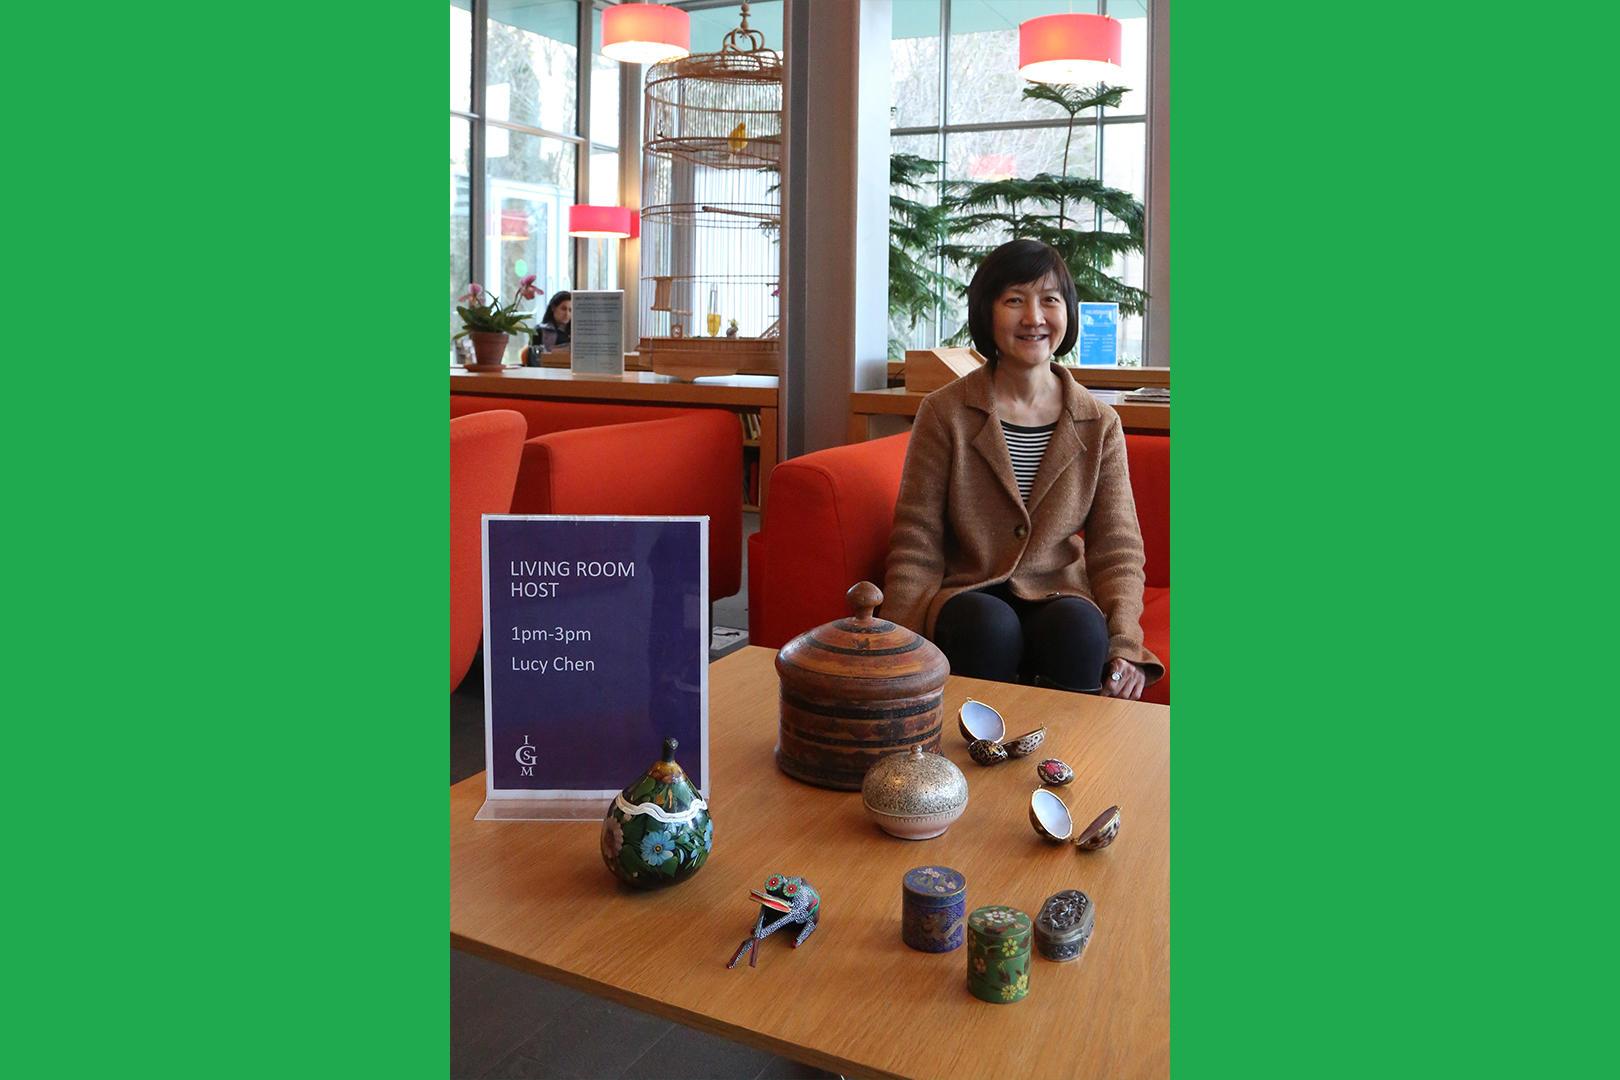 Host Lucy Chen, 2019